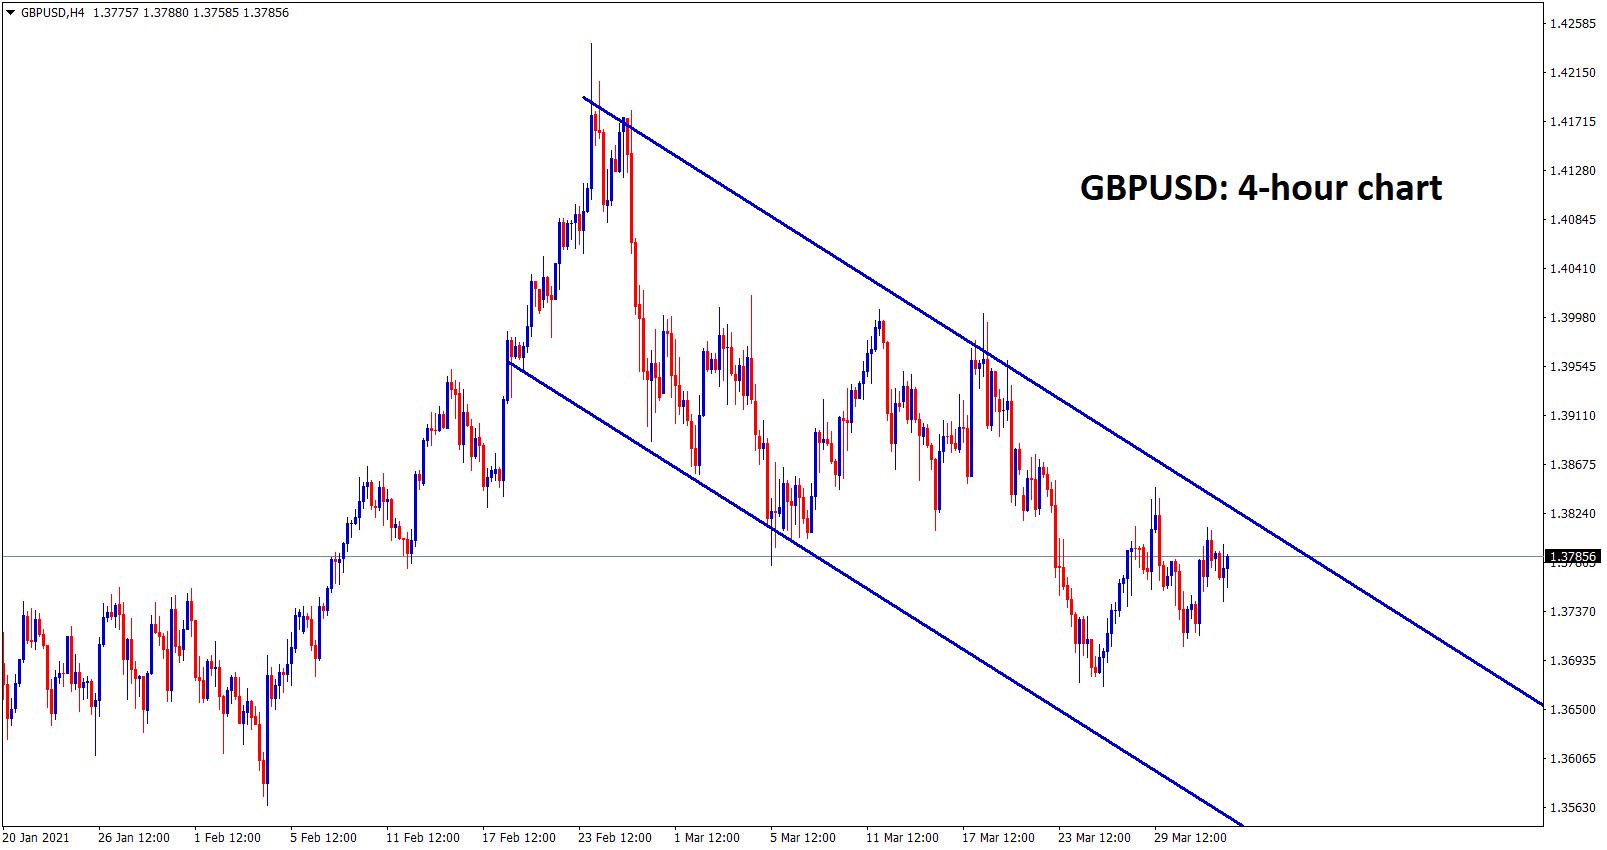 GBPUSD downtrend in h4